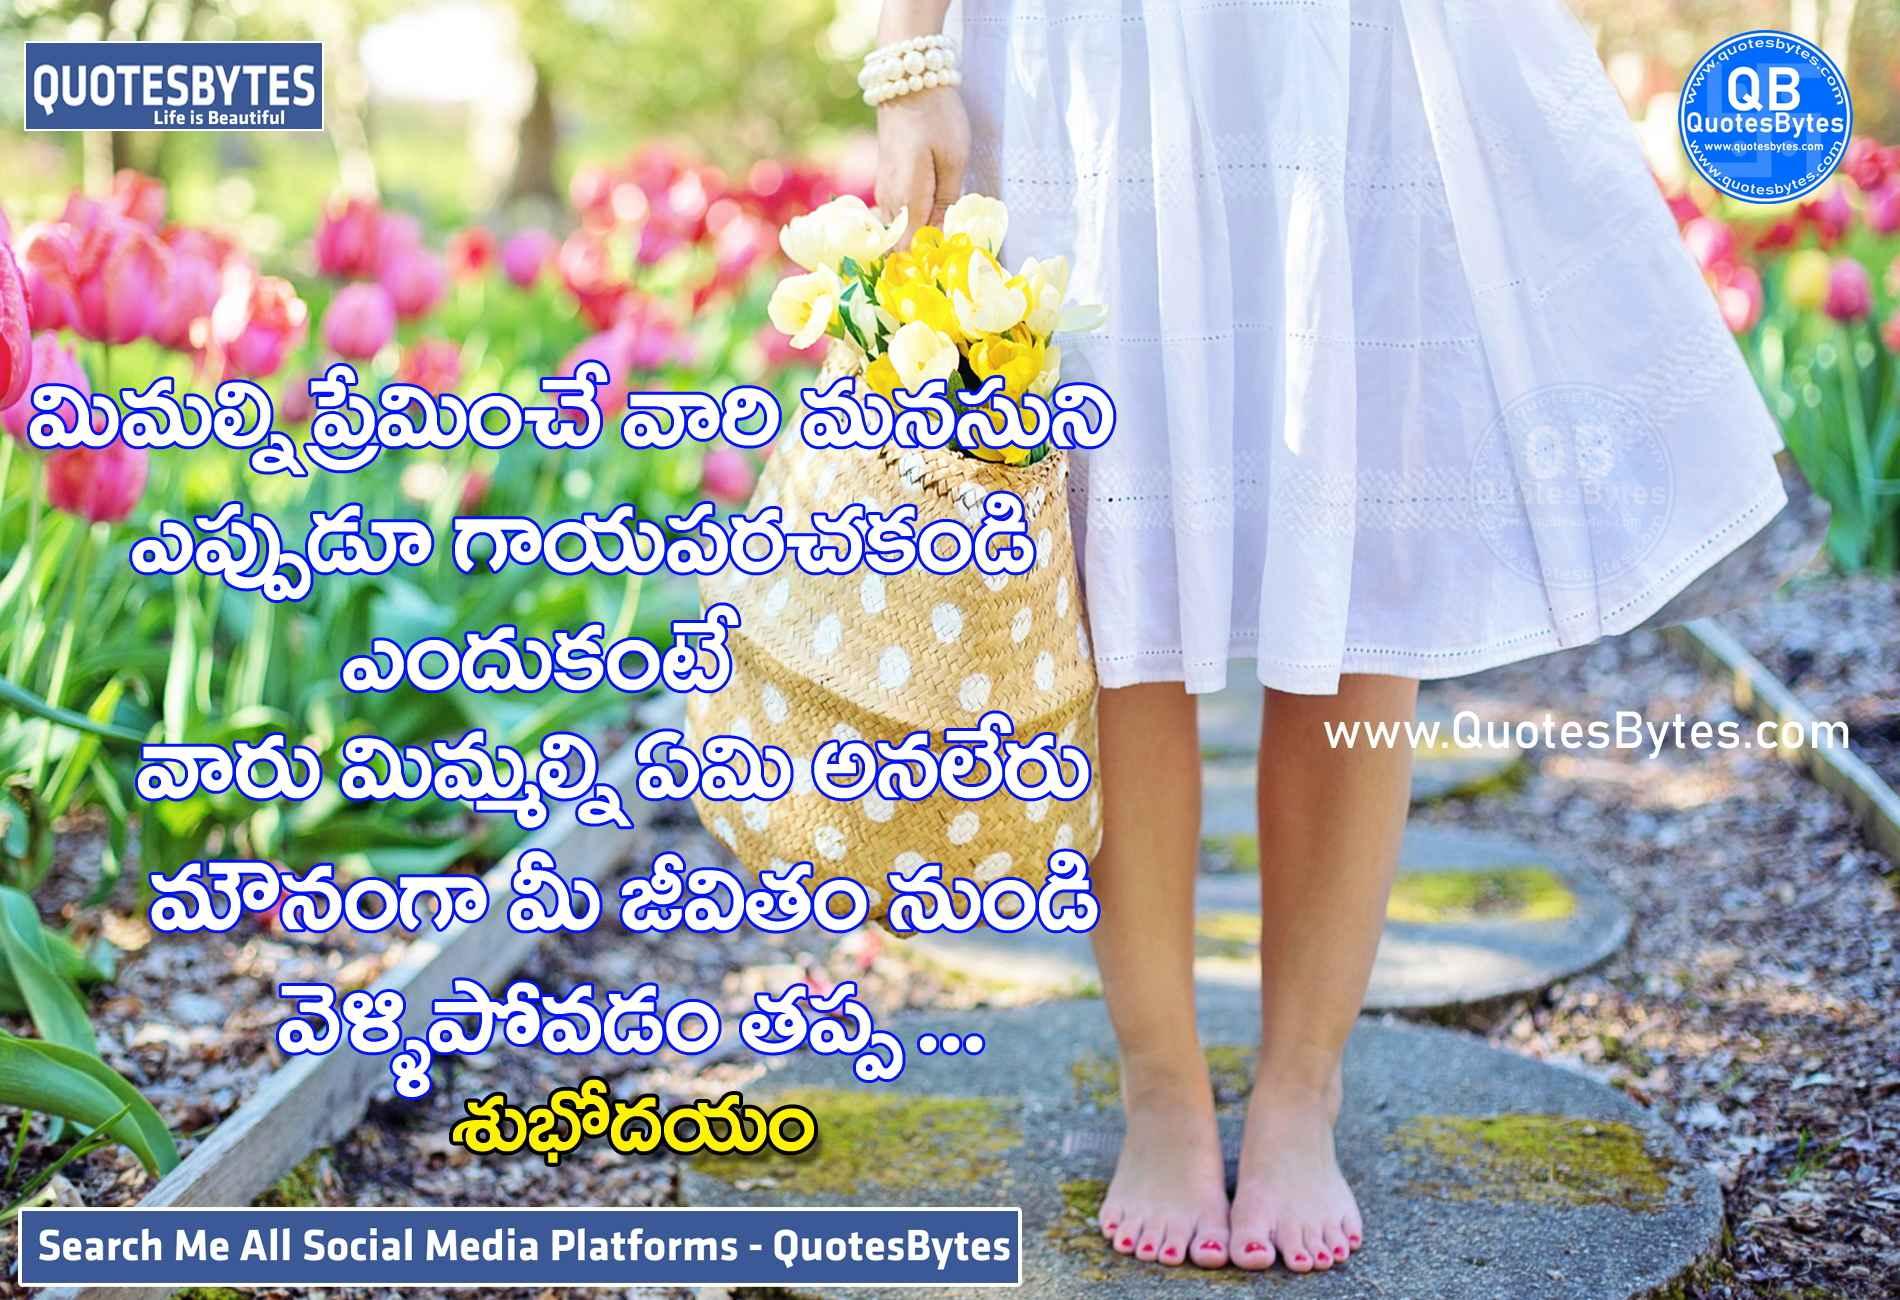 good morning images in telugu-Awesome Telugu Good morning Messages online